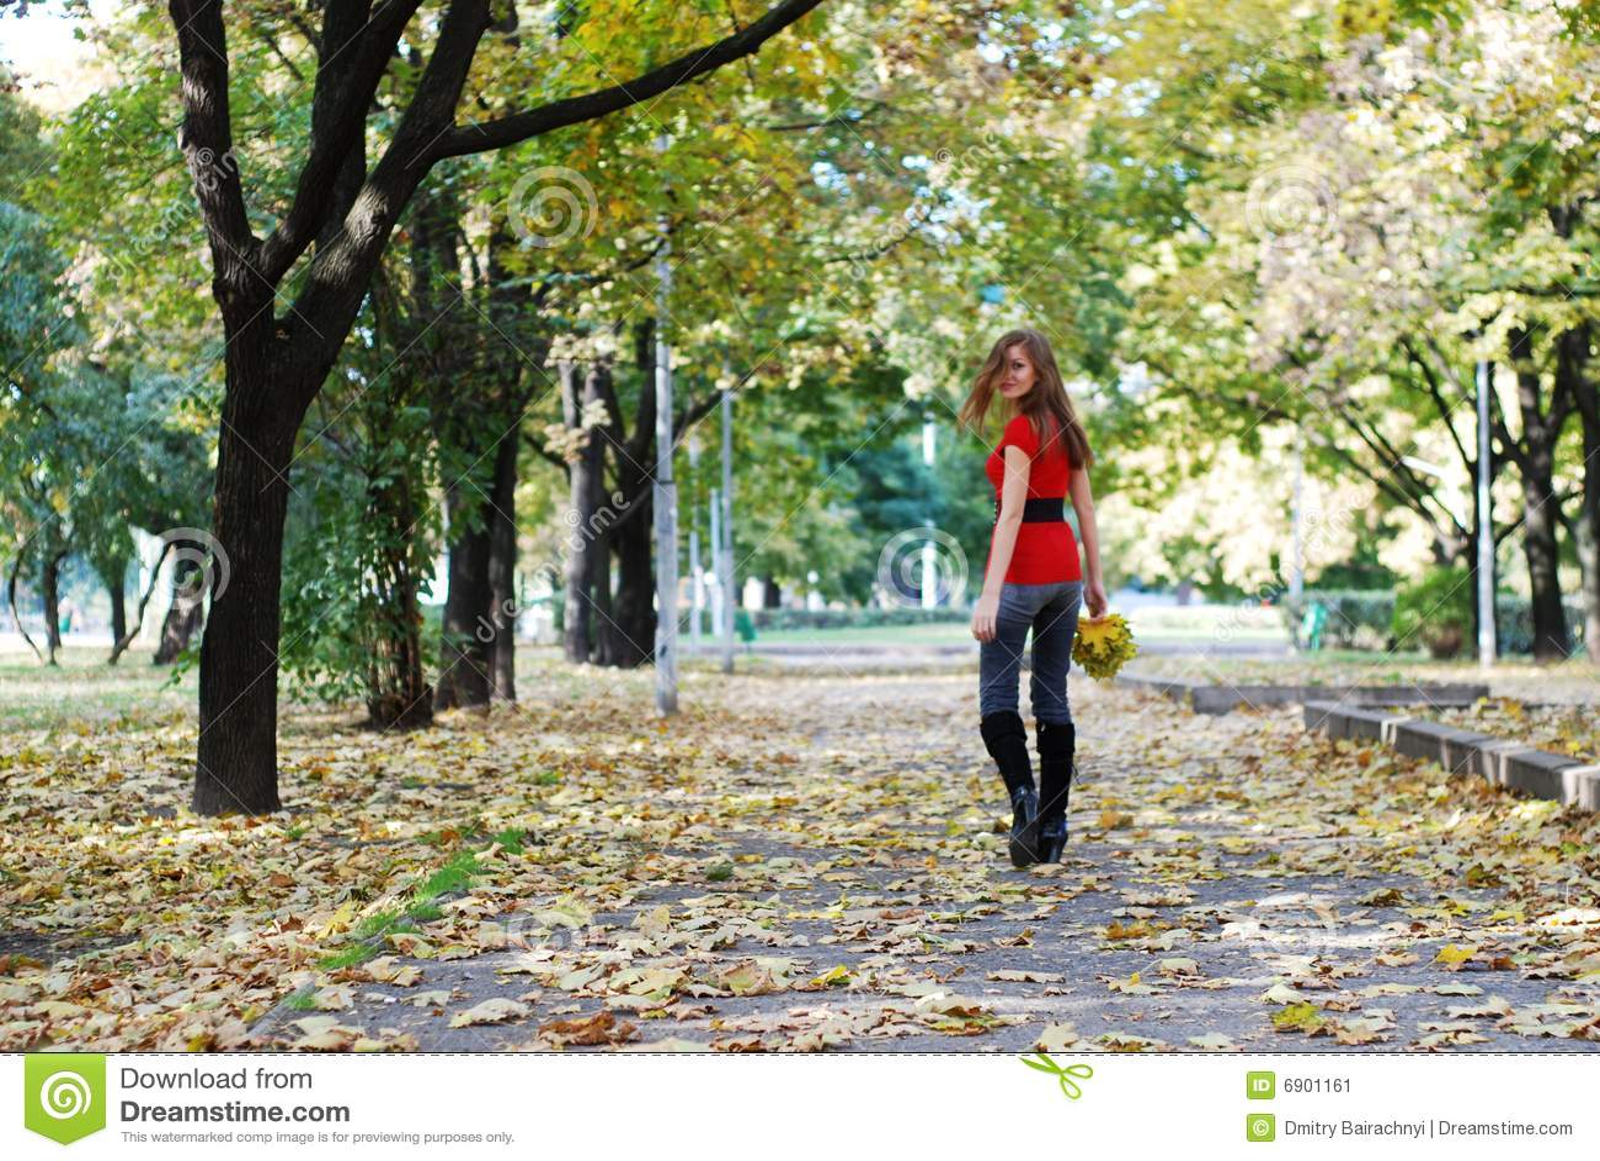 maple park buddhist single women Illinois swingers singles and  states looking for: women or  macon mahomet makanda maple park marengo marion markham marseilles.